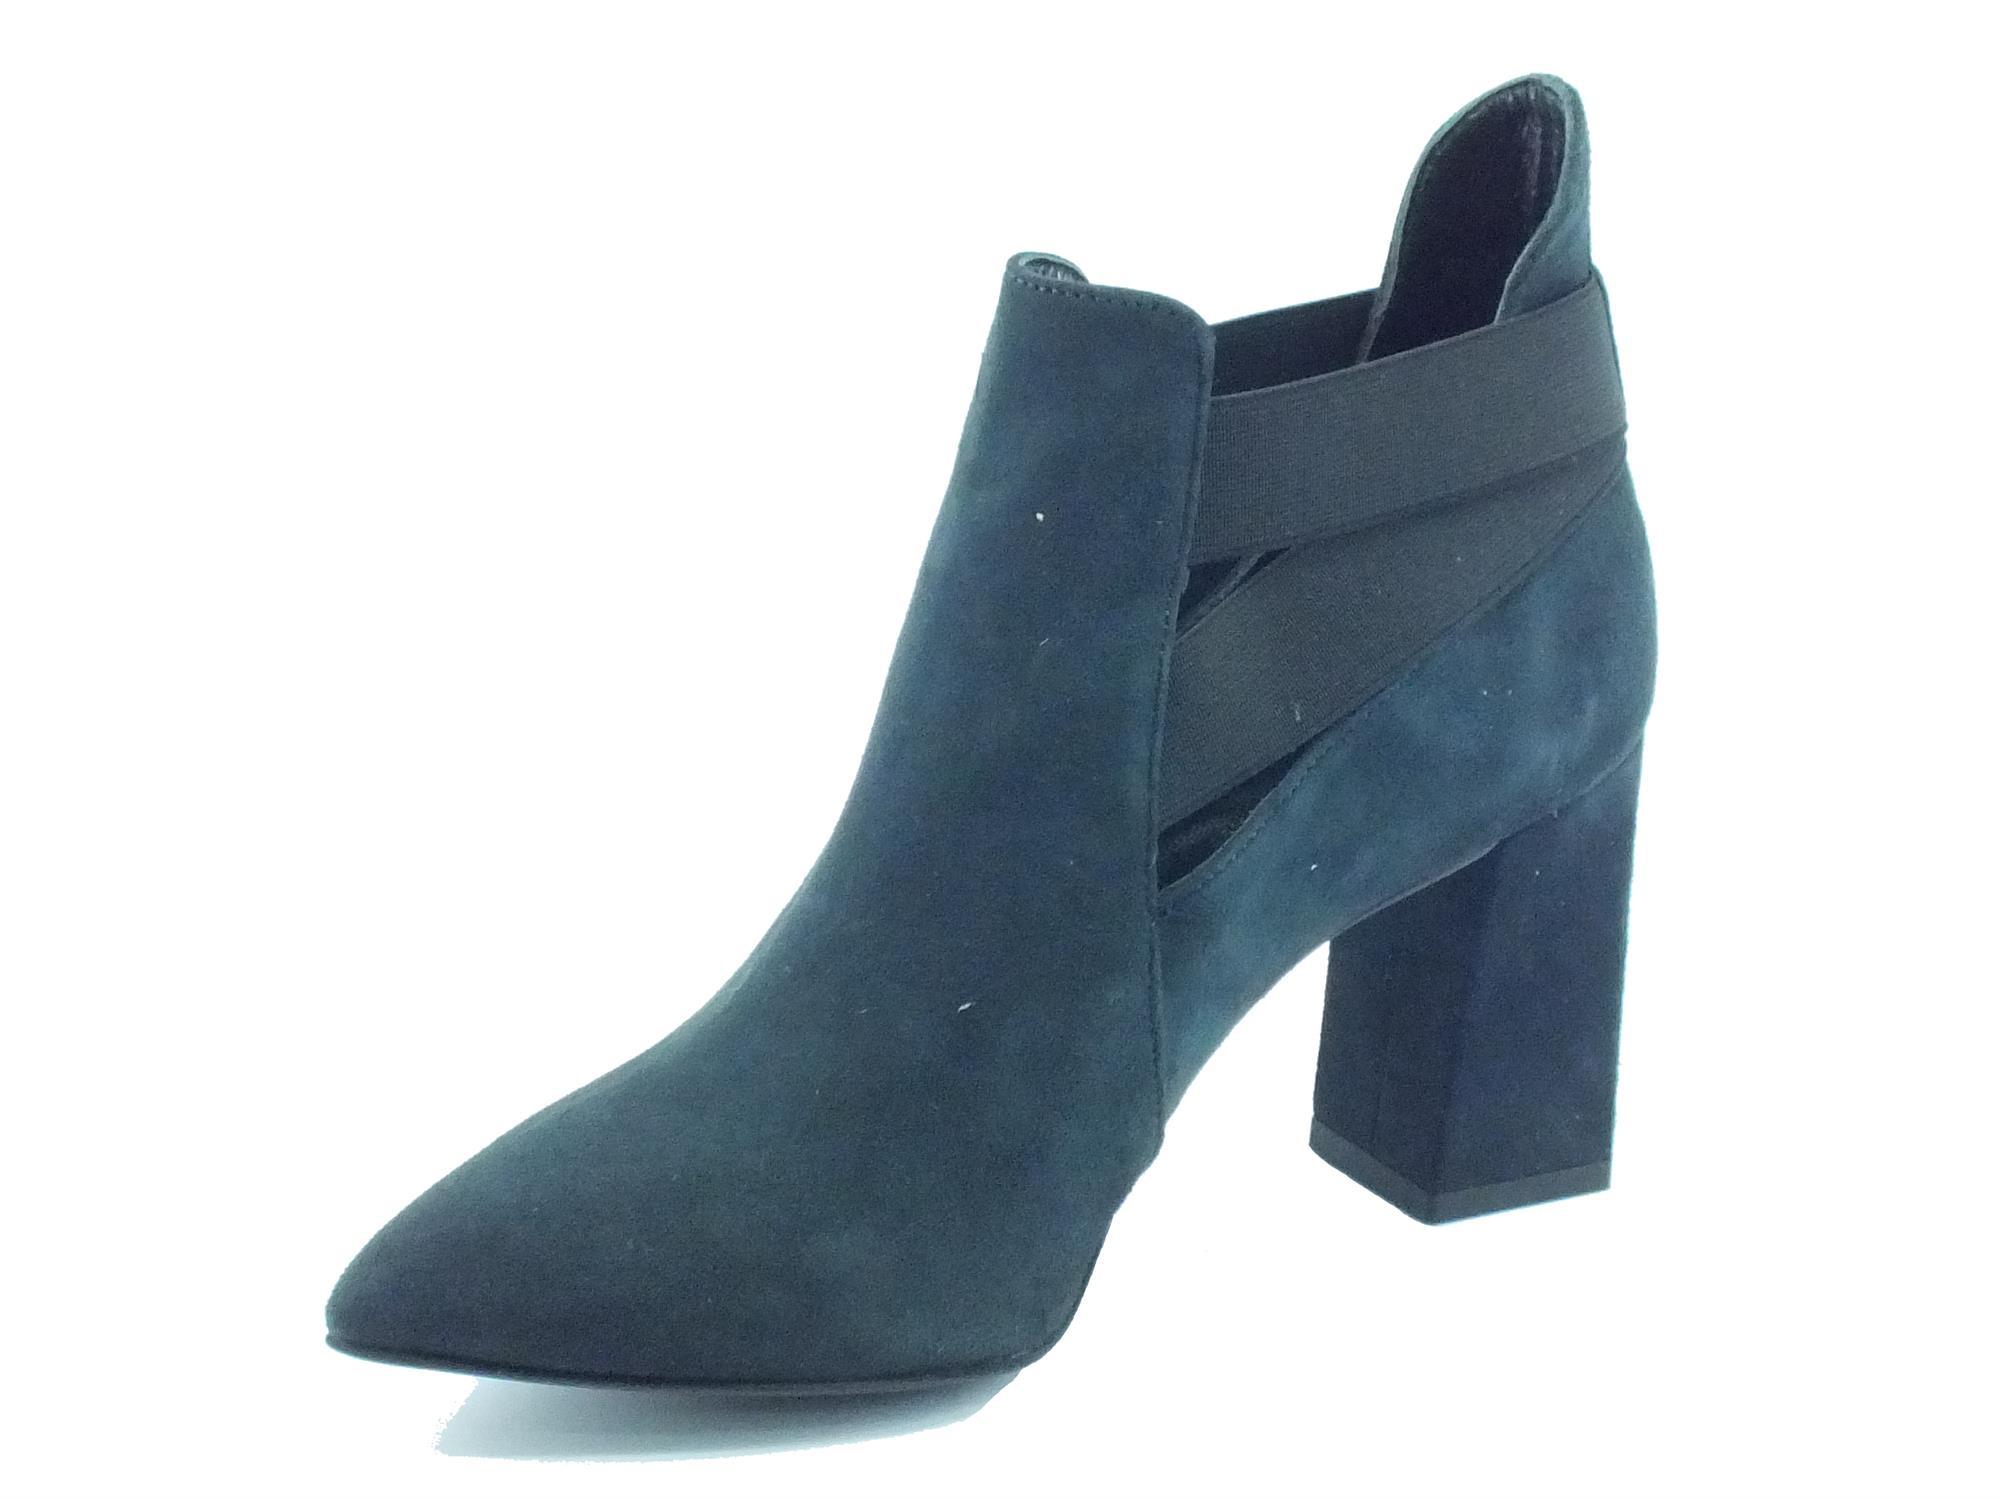 ... Tronchetti a punta CafèNoir per donna in camoscio blu ...